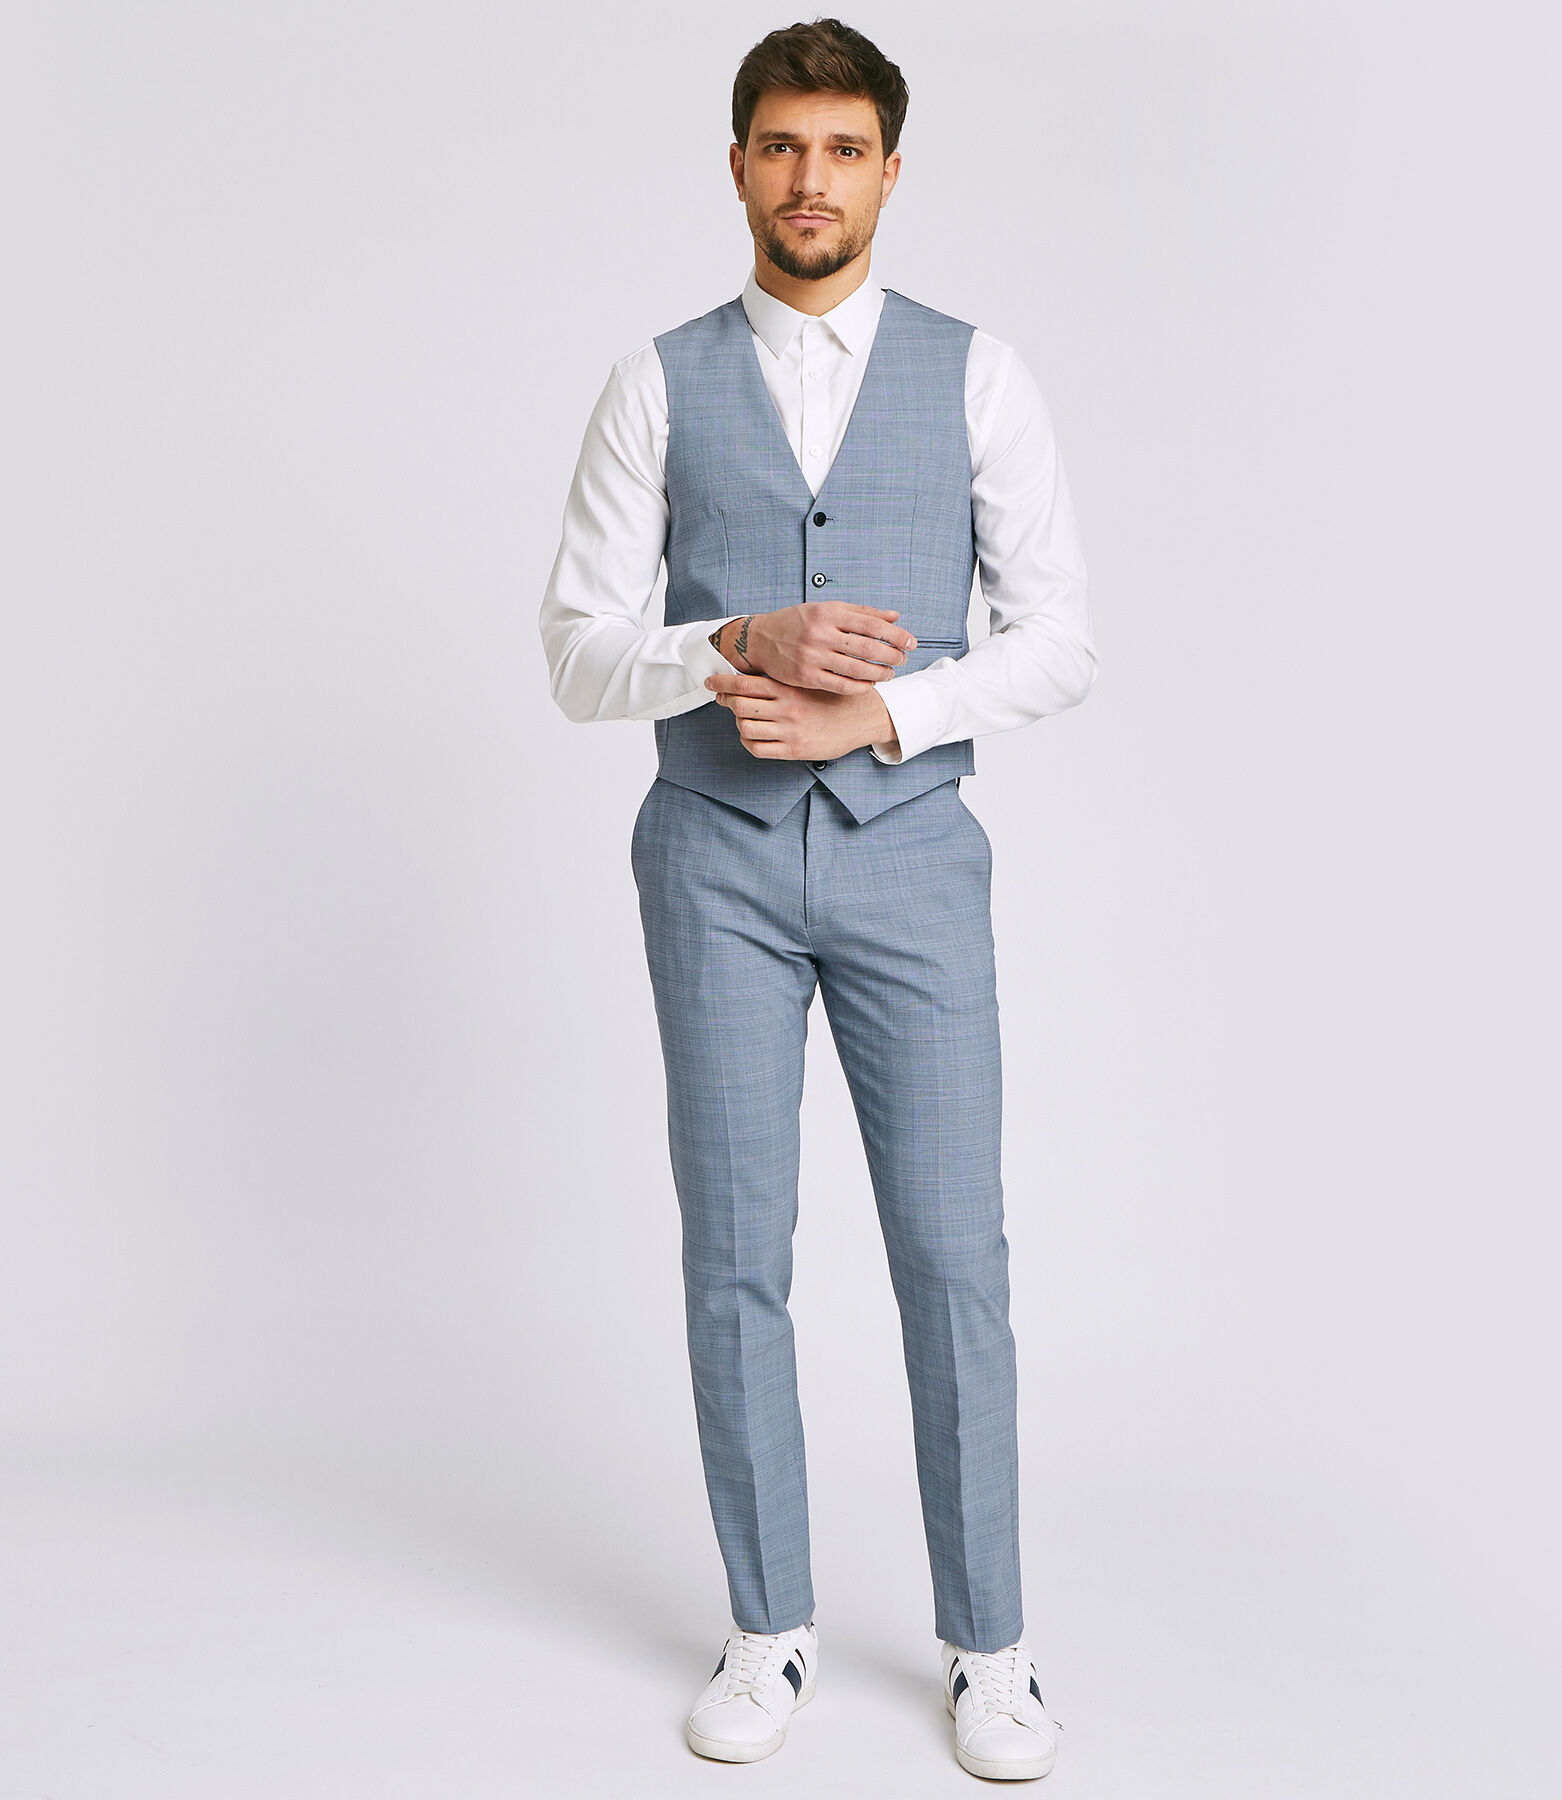 Pantalon Costume Bleu Ciel